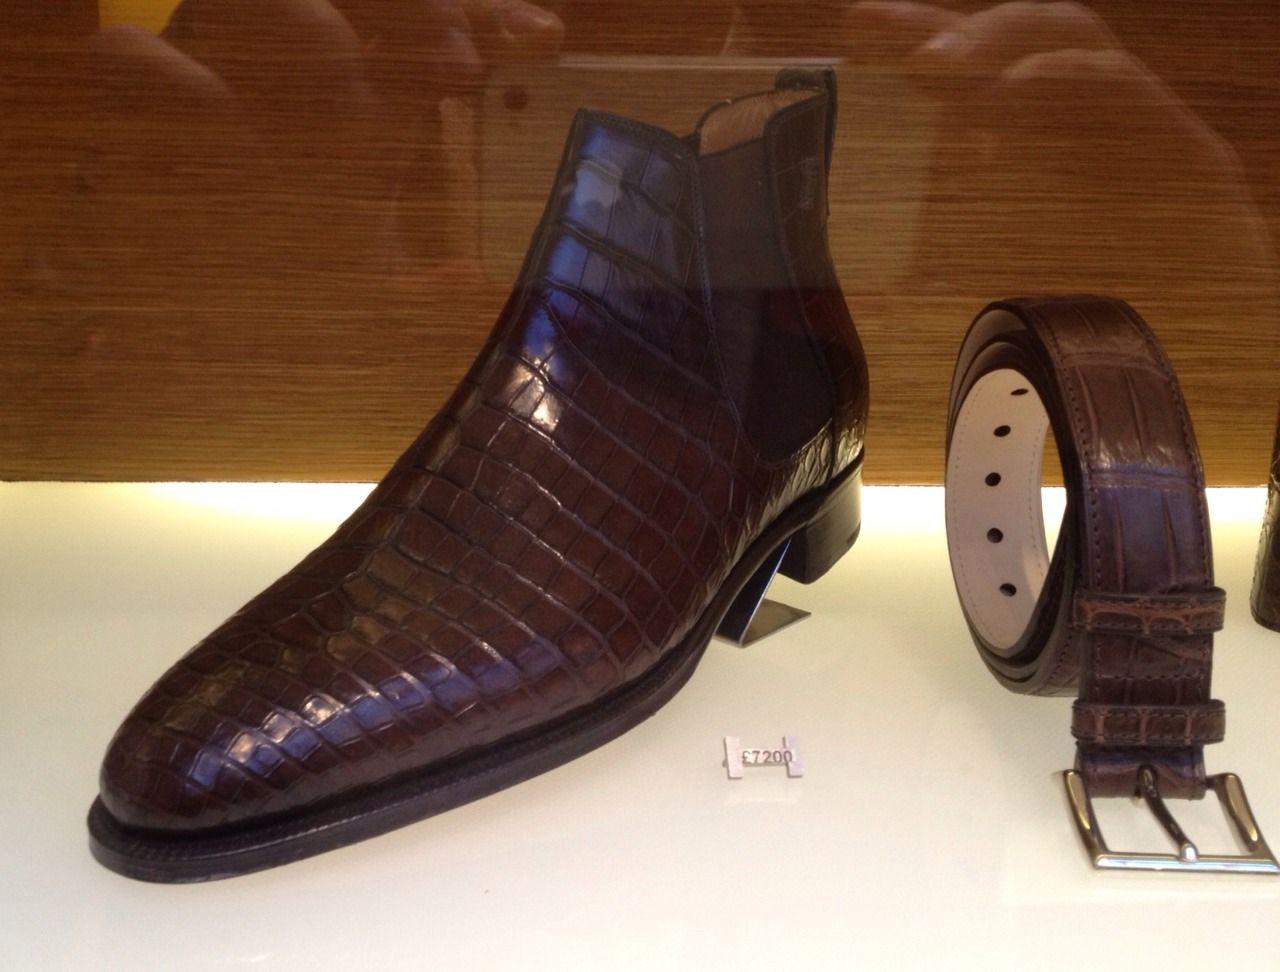 dandyshoecare: John Lobb Alligator Chelsea boot at £7200